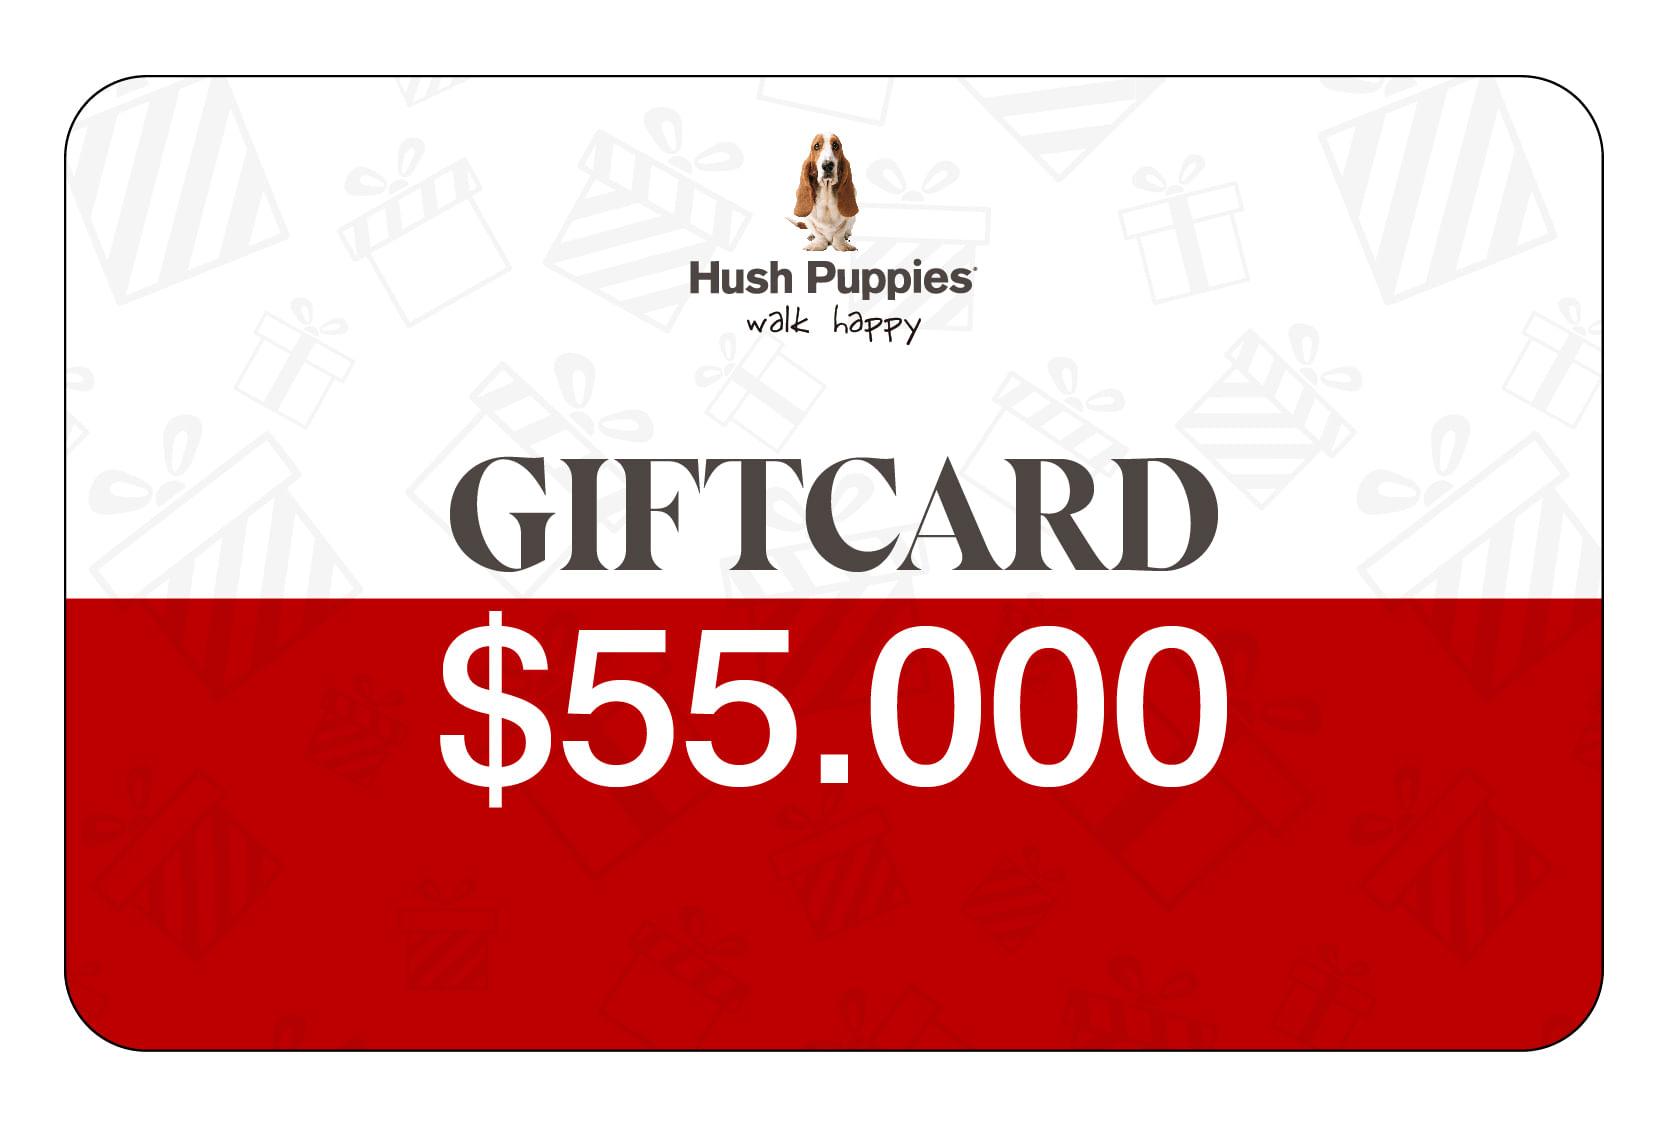 Gift Card $55.000